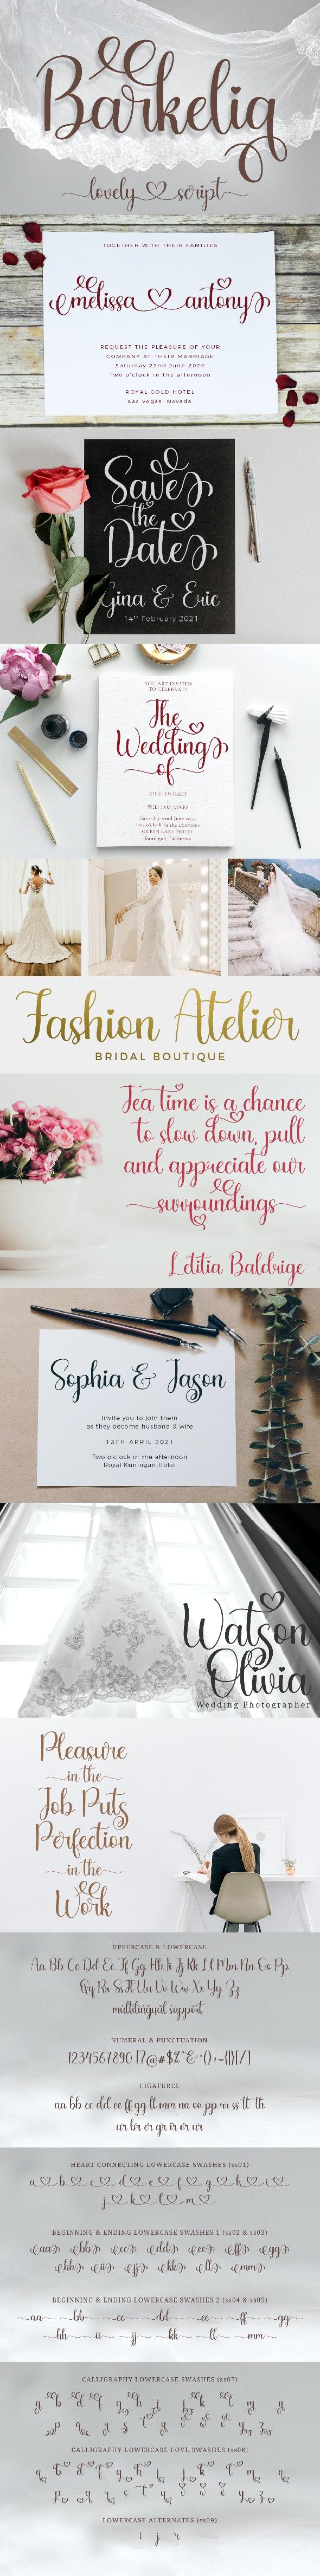 Barkelia Lovely Script - Calligraphy Script